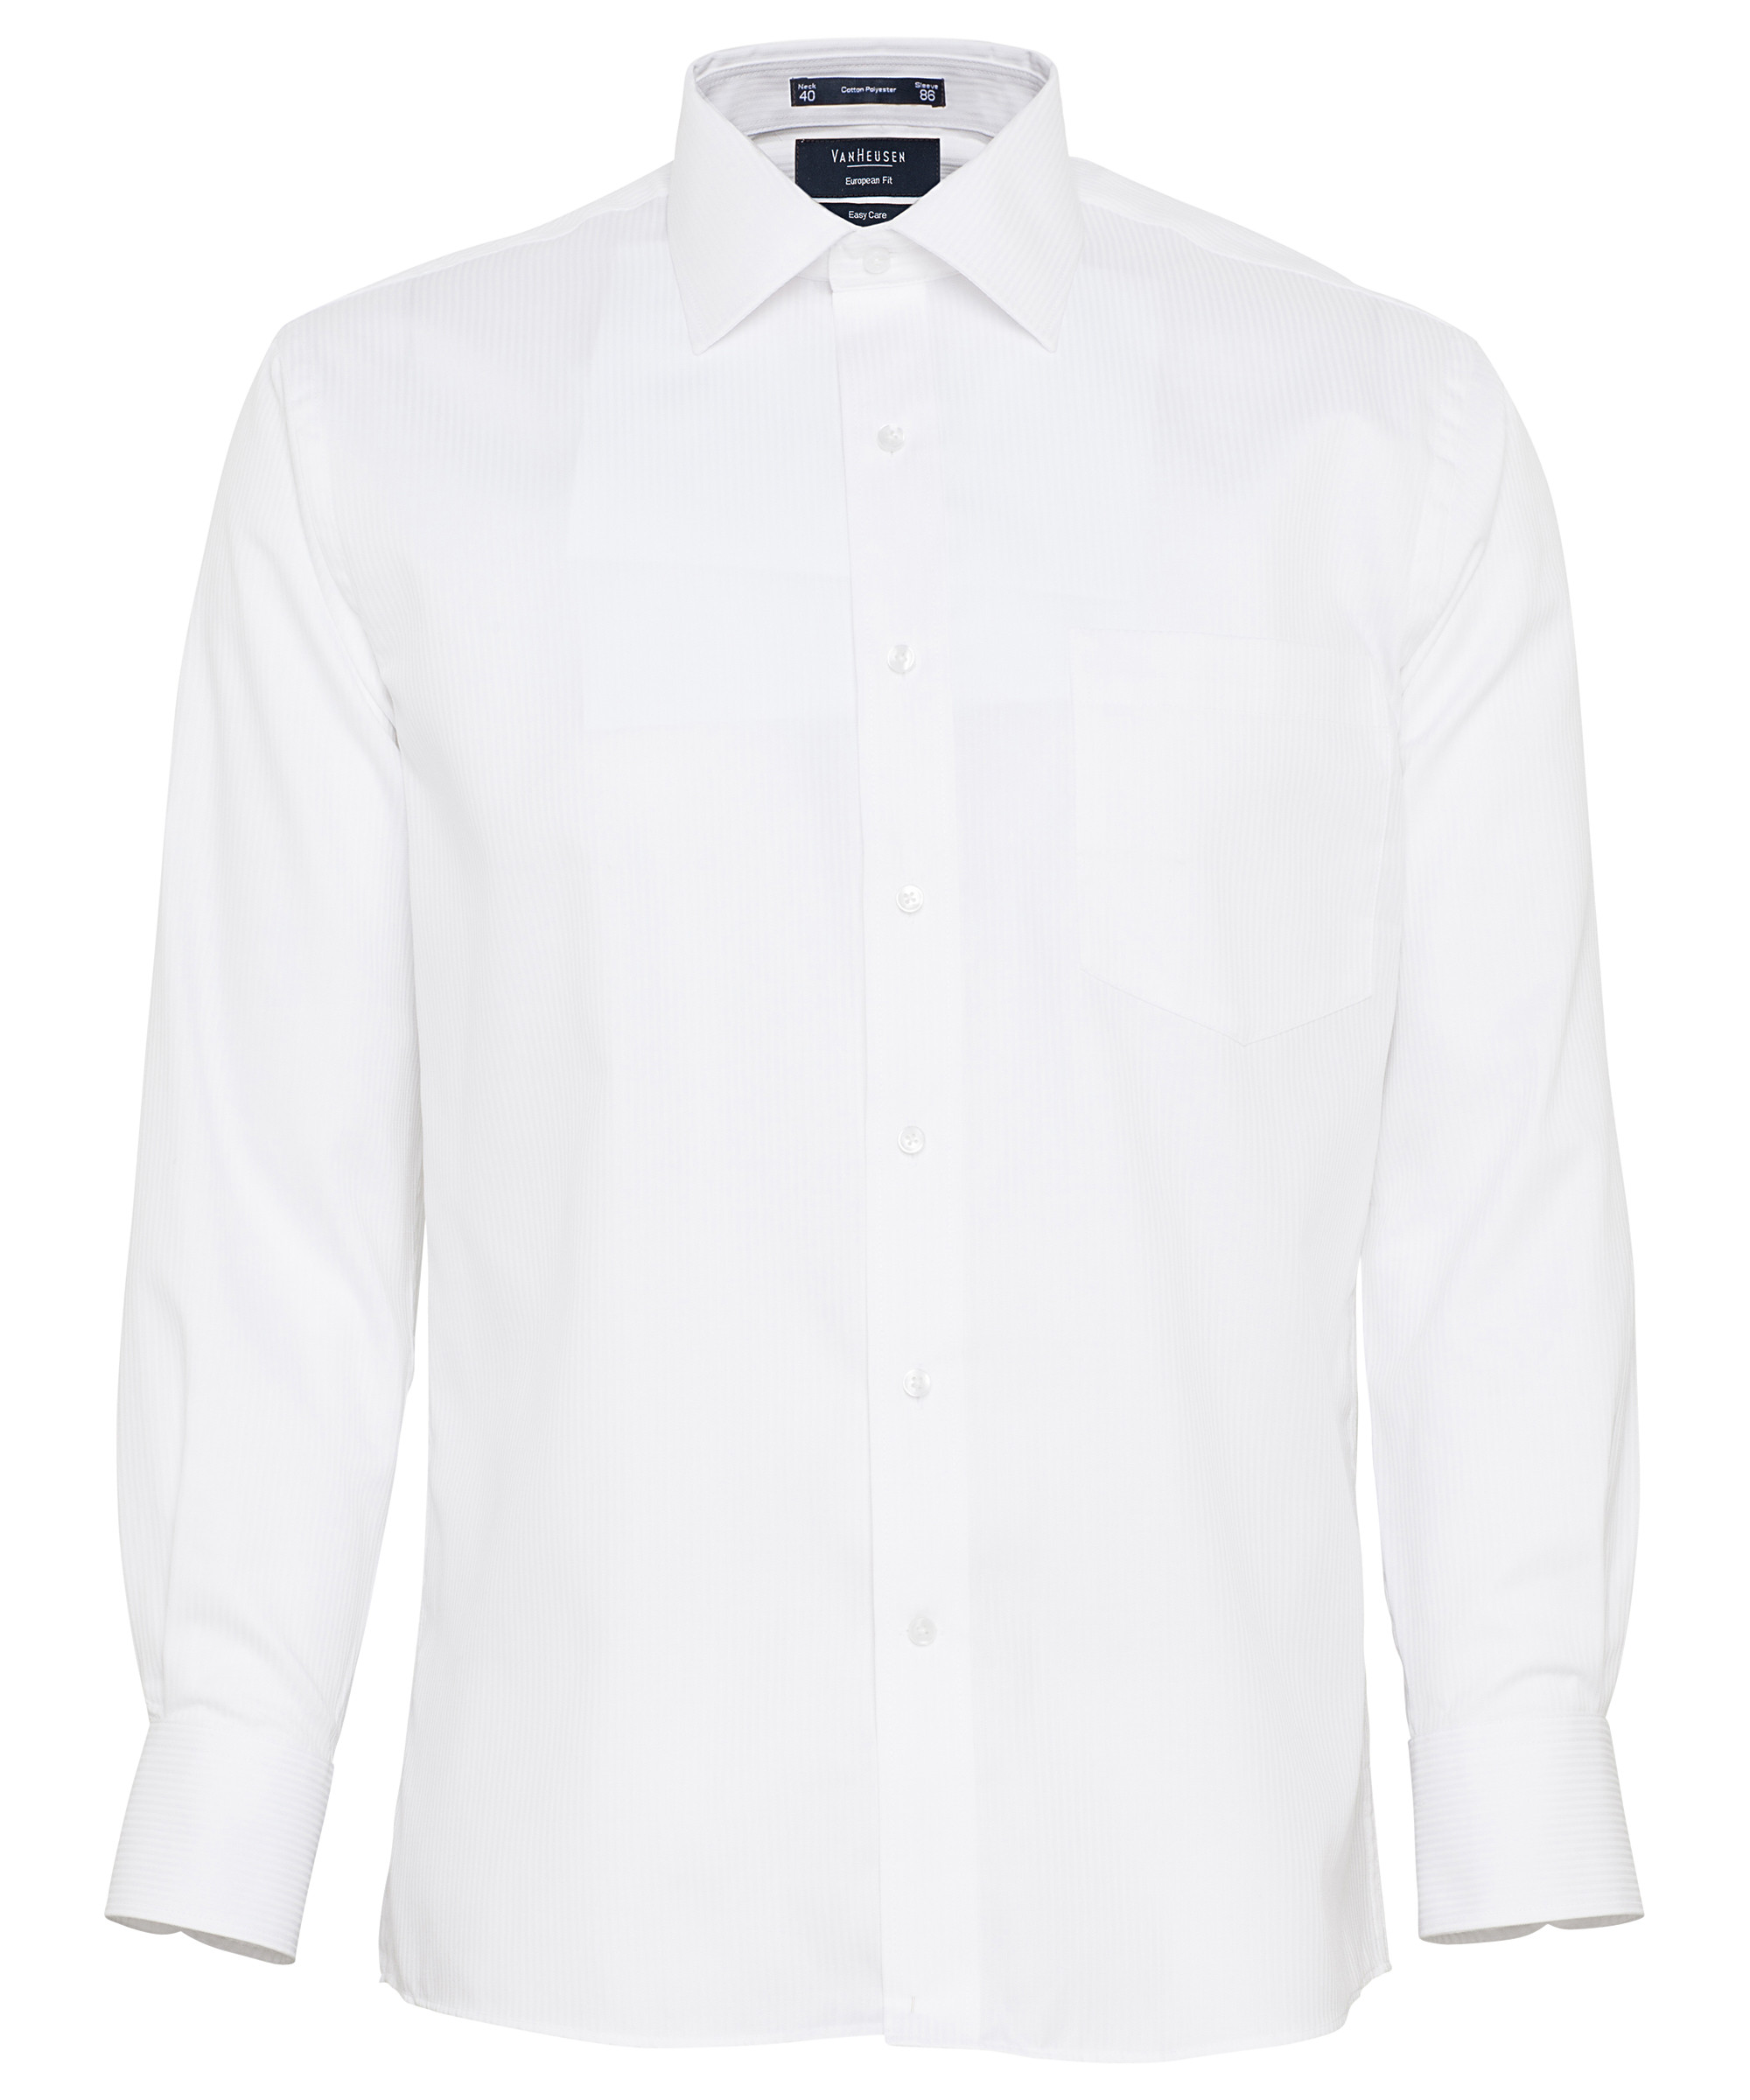 7c92f99e087 Van Heusen. Men s European Tailored Fit Shirt Cotton Polyester Mini  Herringbone Easy Care